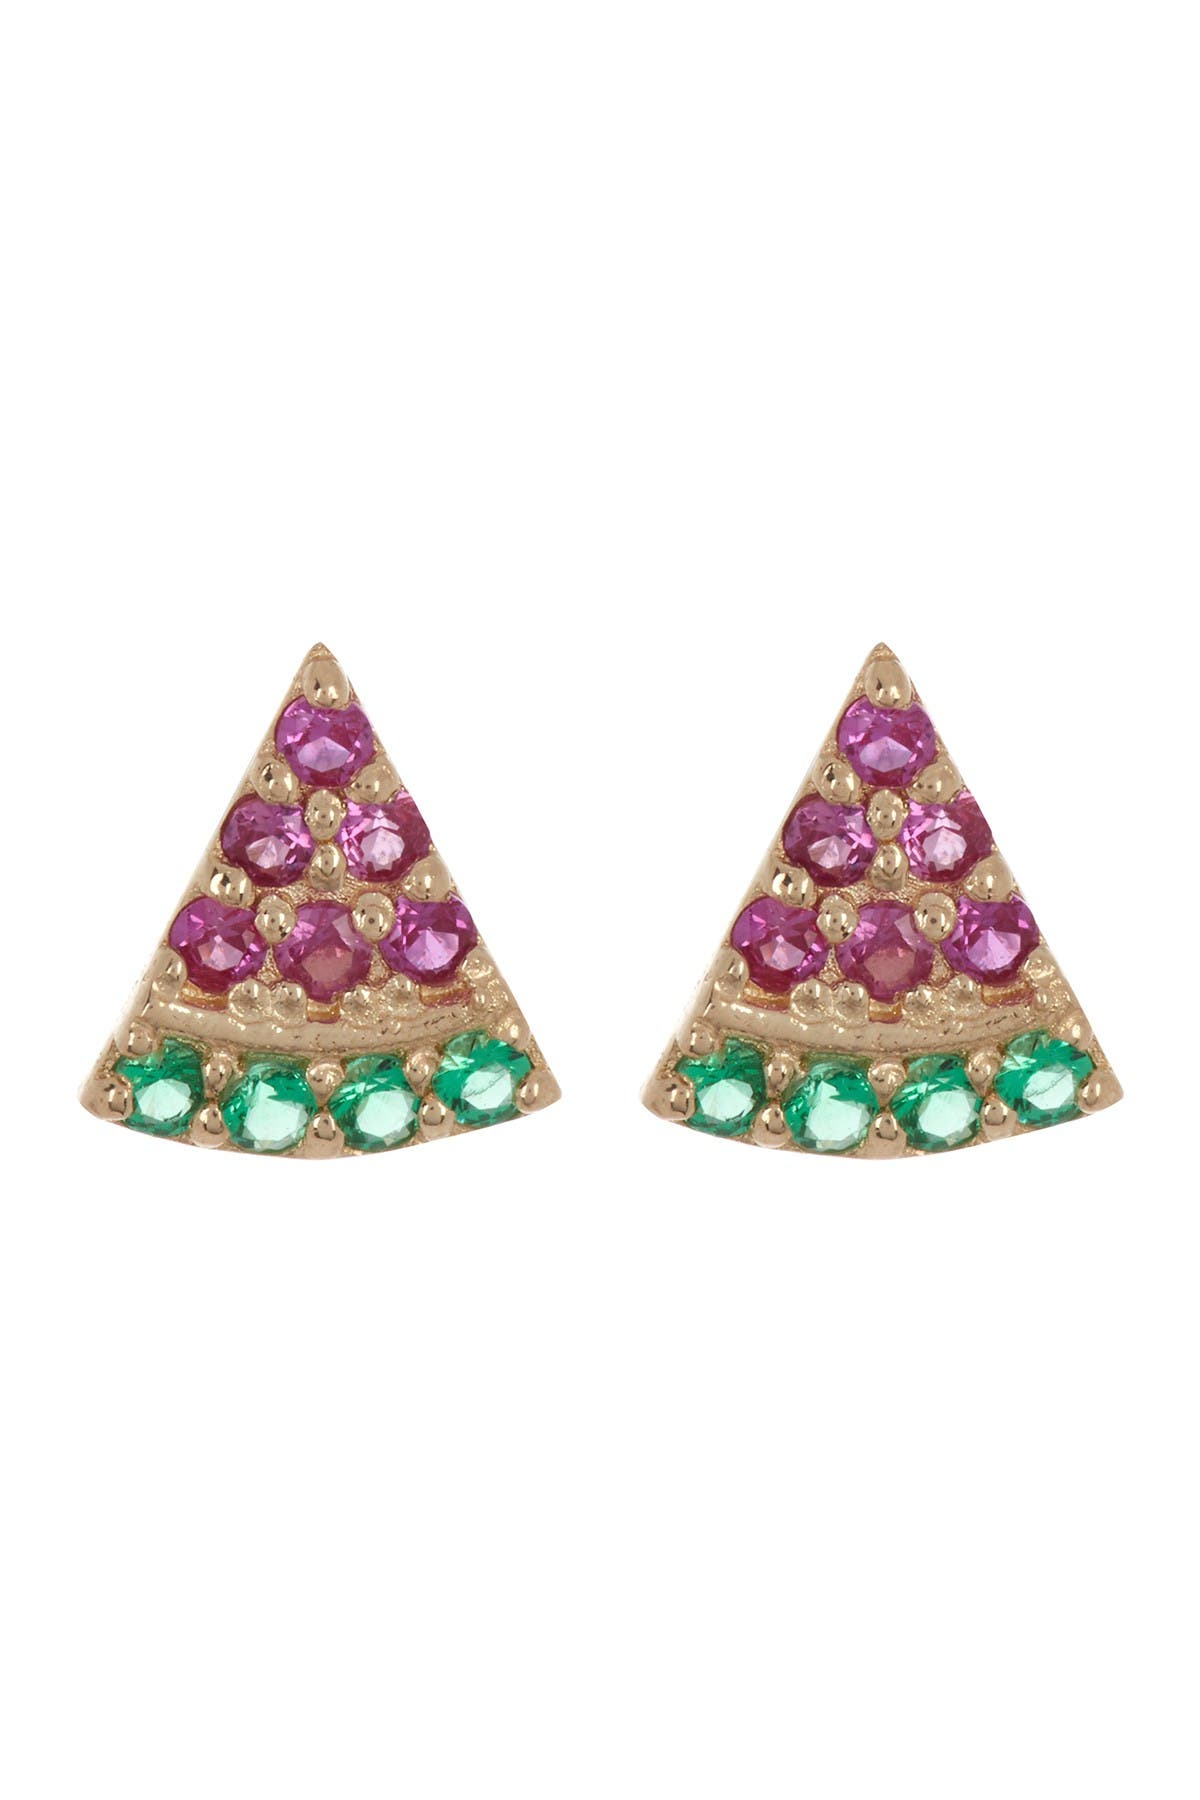 Image of Candela 10K Yellow Gold CZ Watermelon Stud Earrings